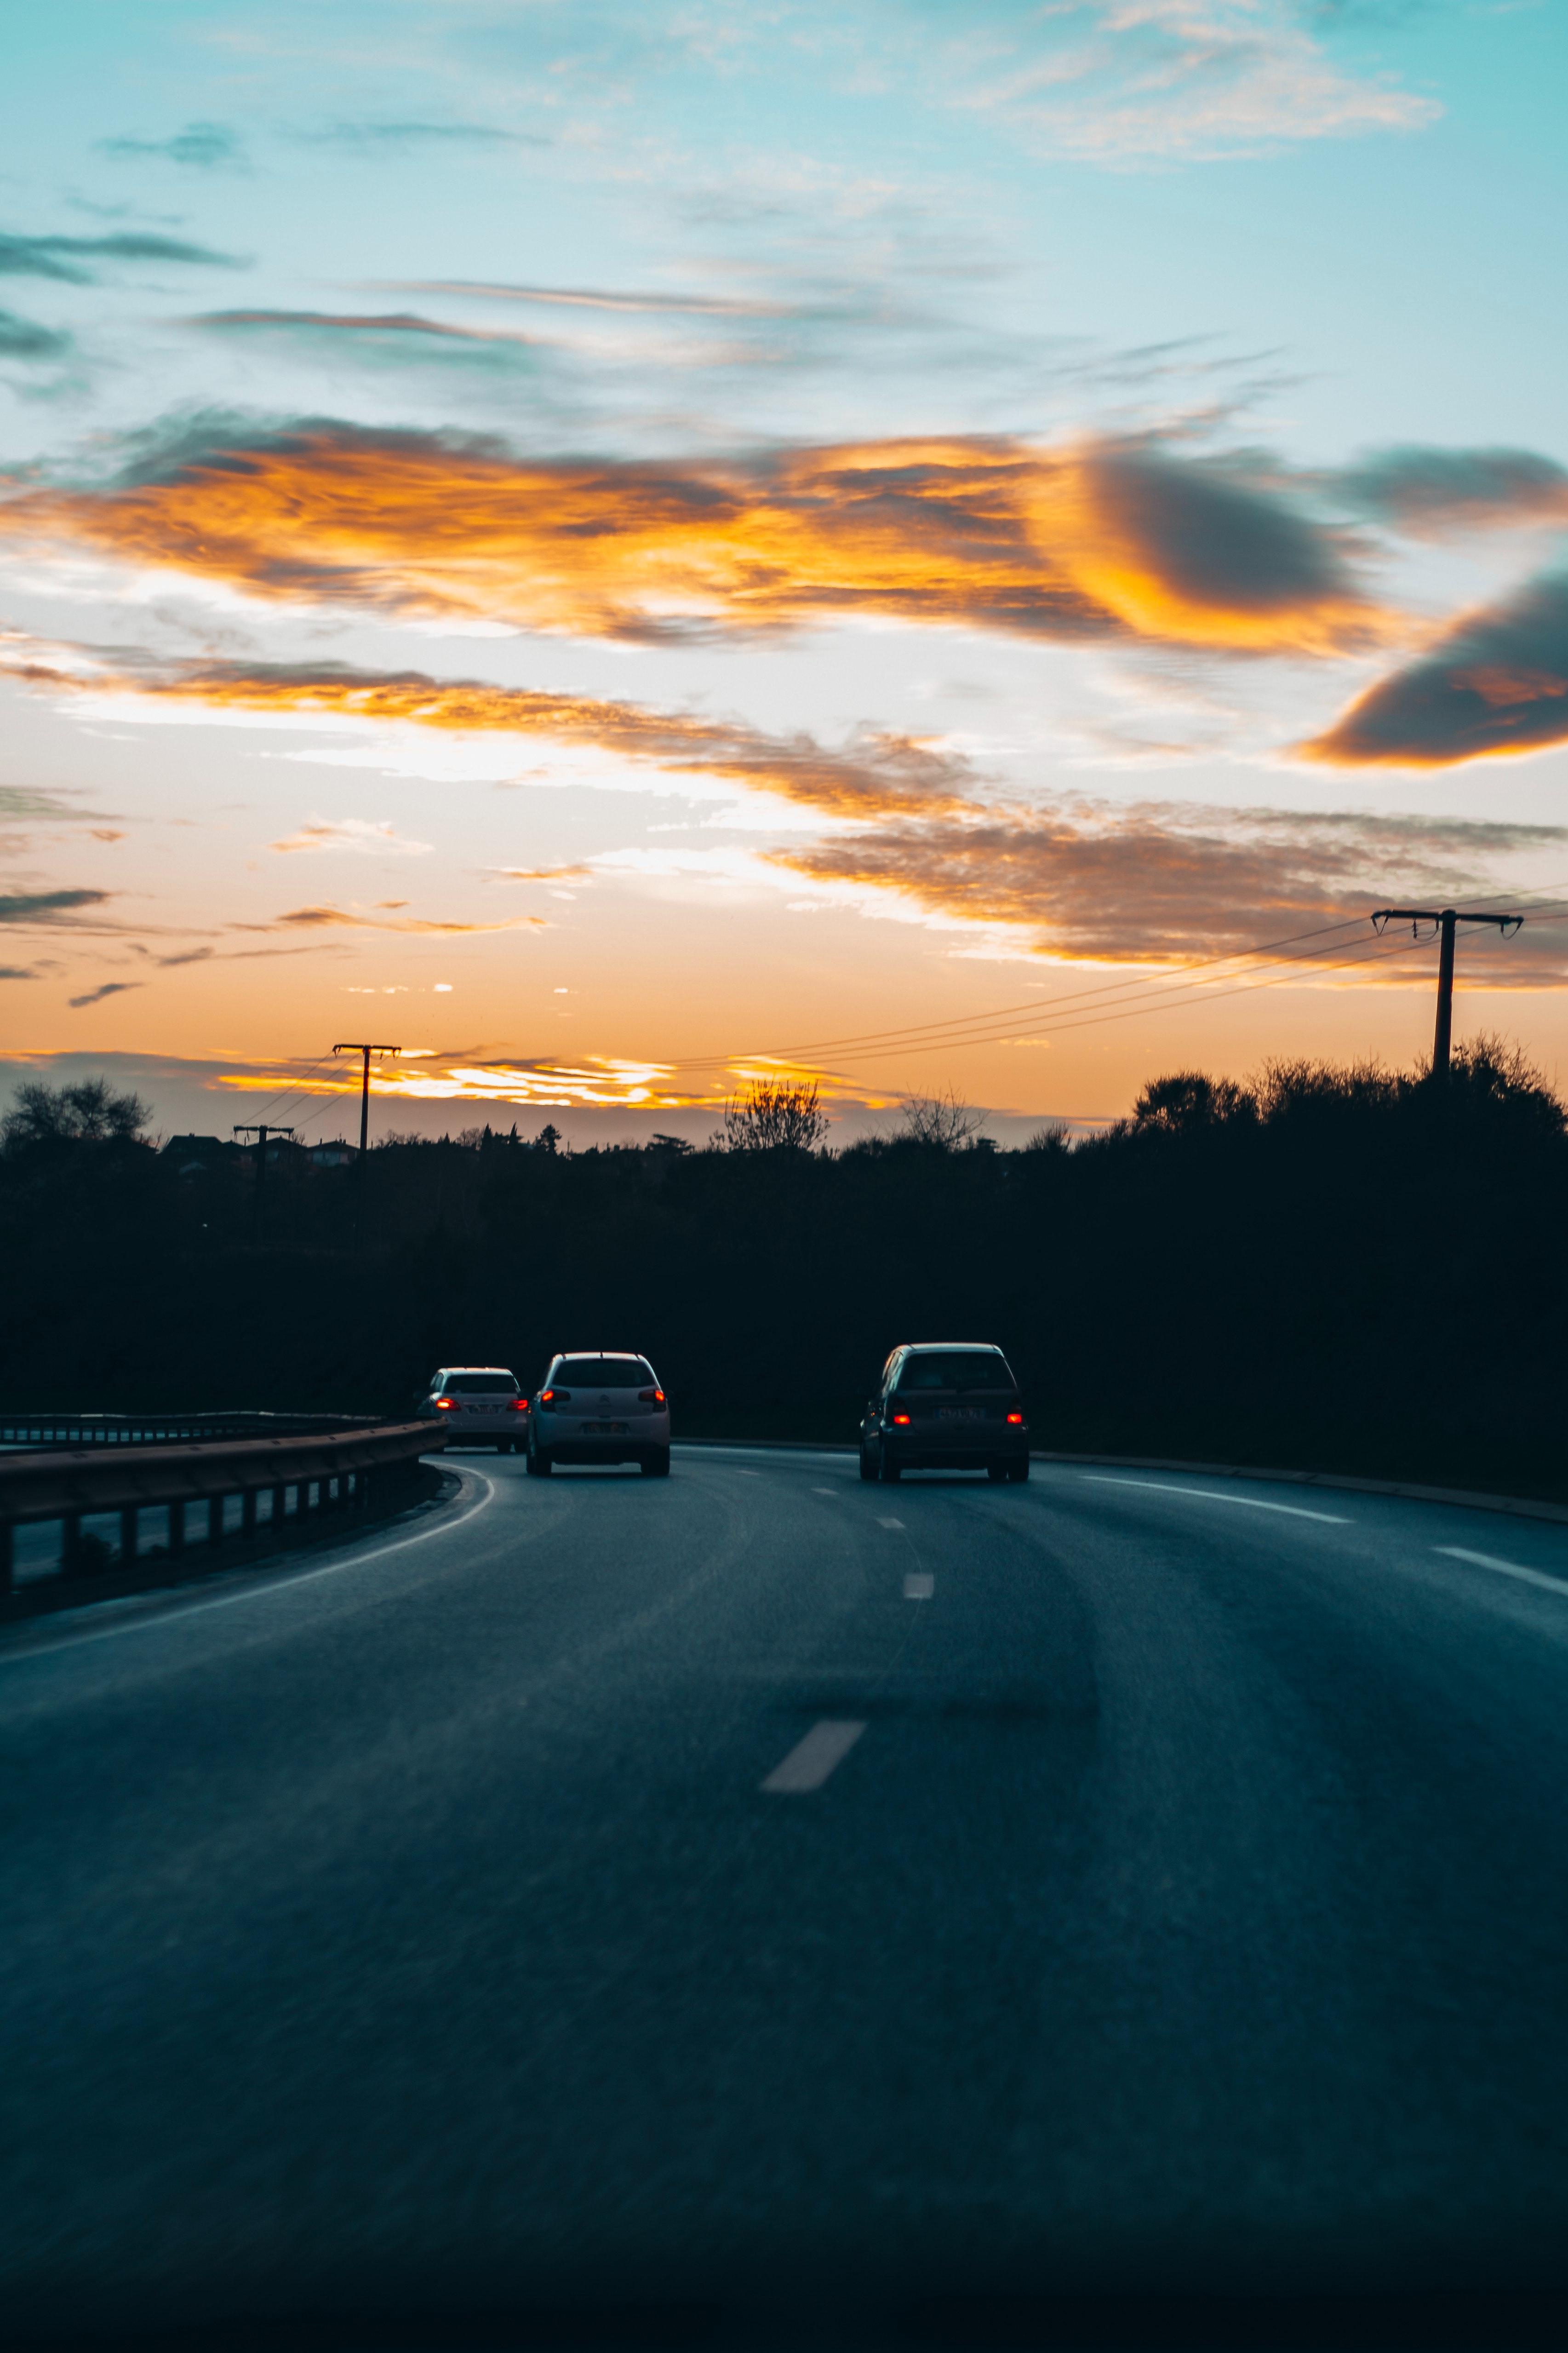 asphalt-cars-clouds-2006745.jpg